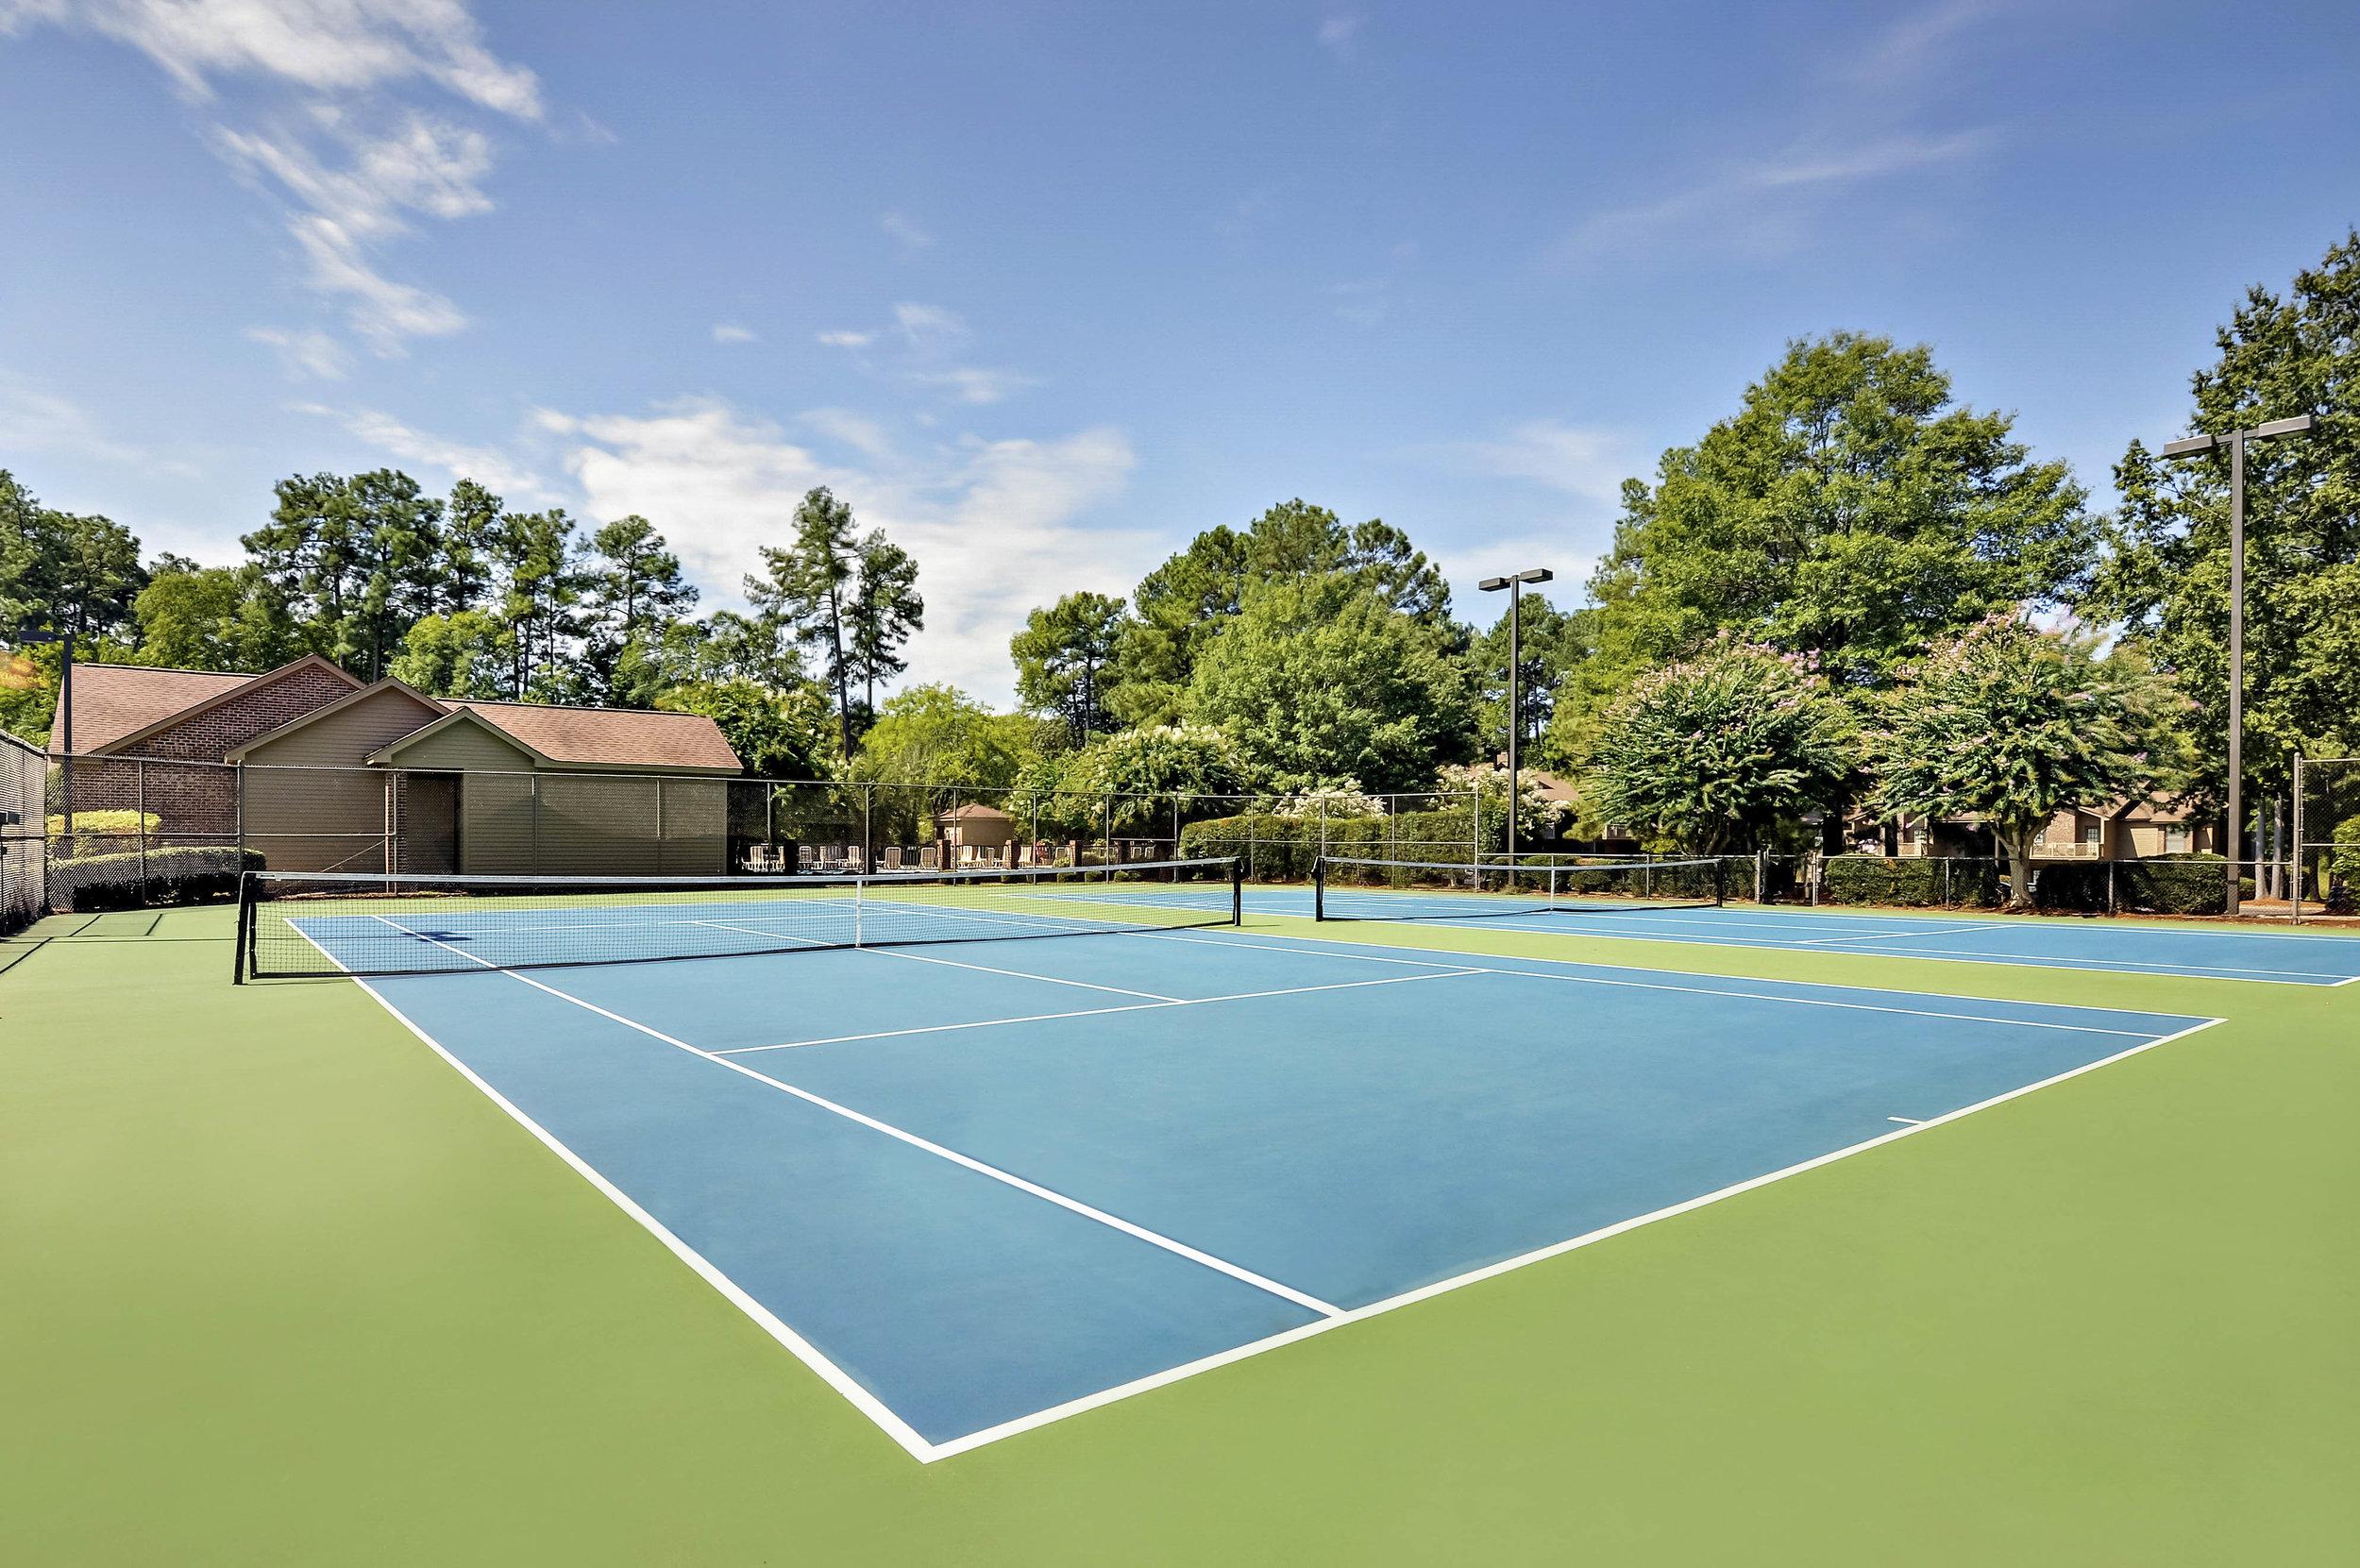 Tennis-Court-Wildwood-Trace-Rocky-Mount-NC-PJ03159-PH-9 2.JPG